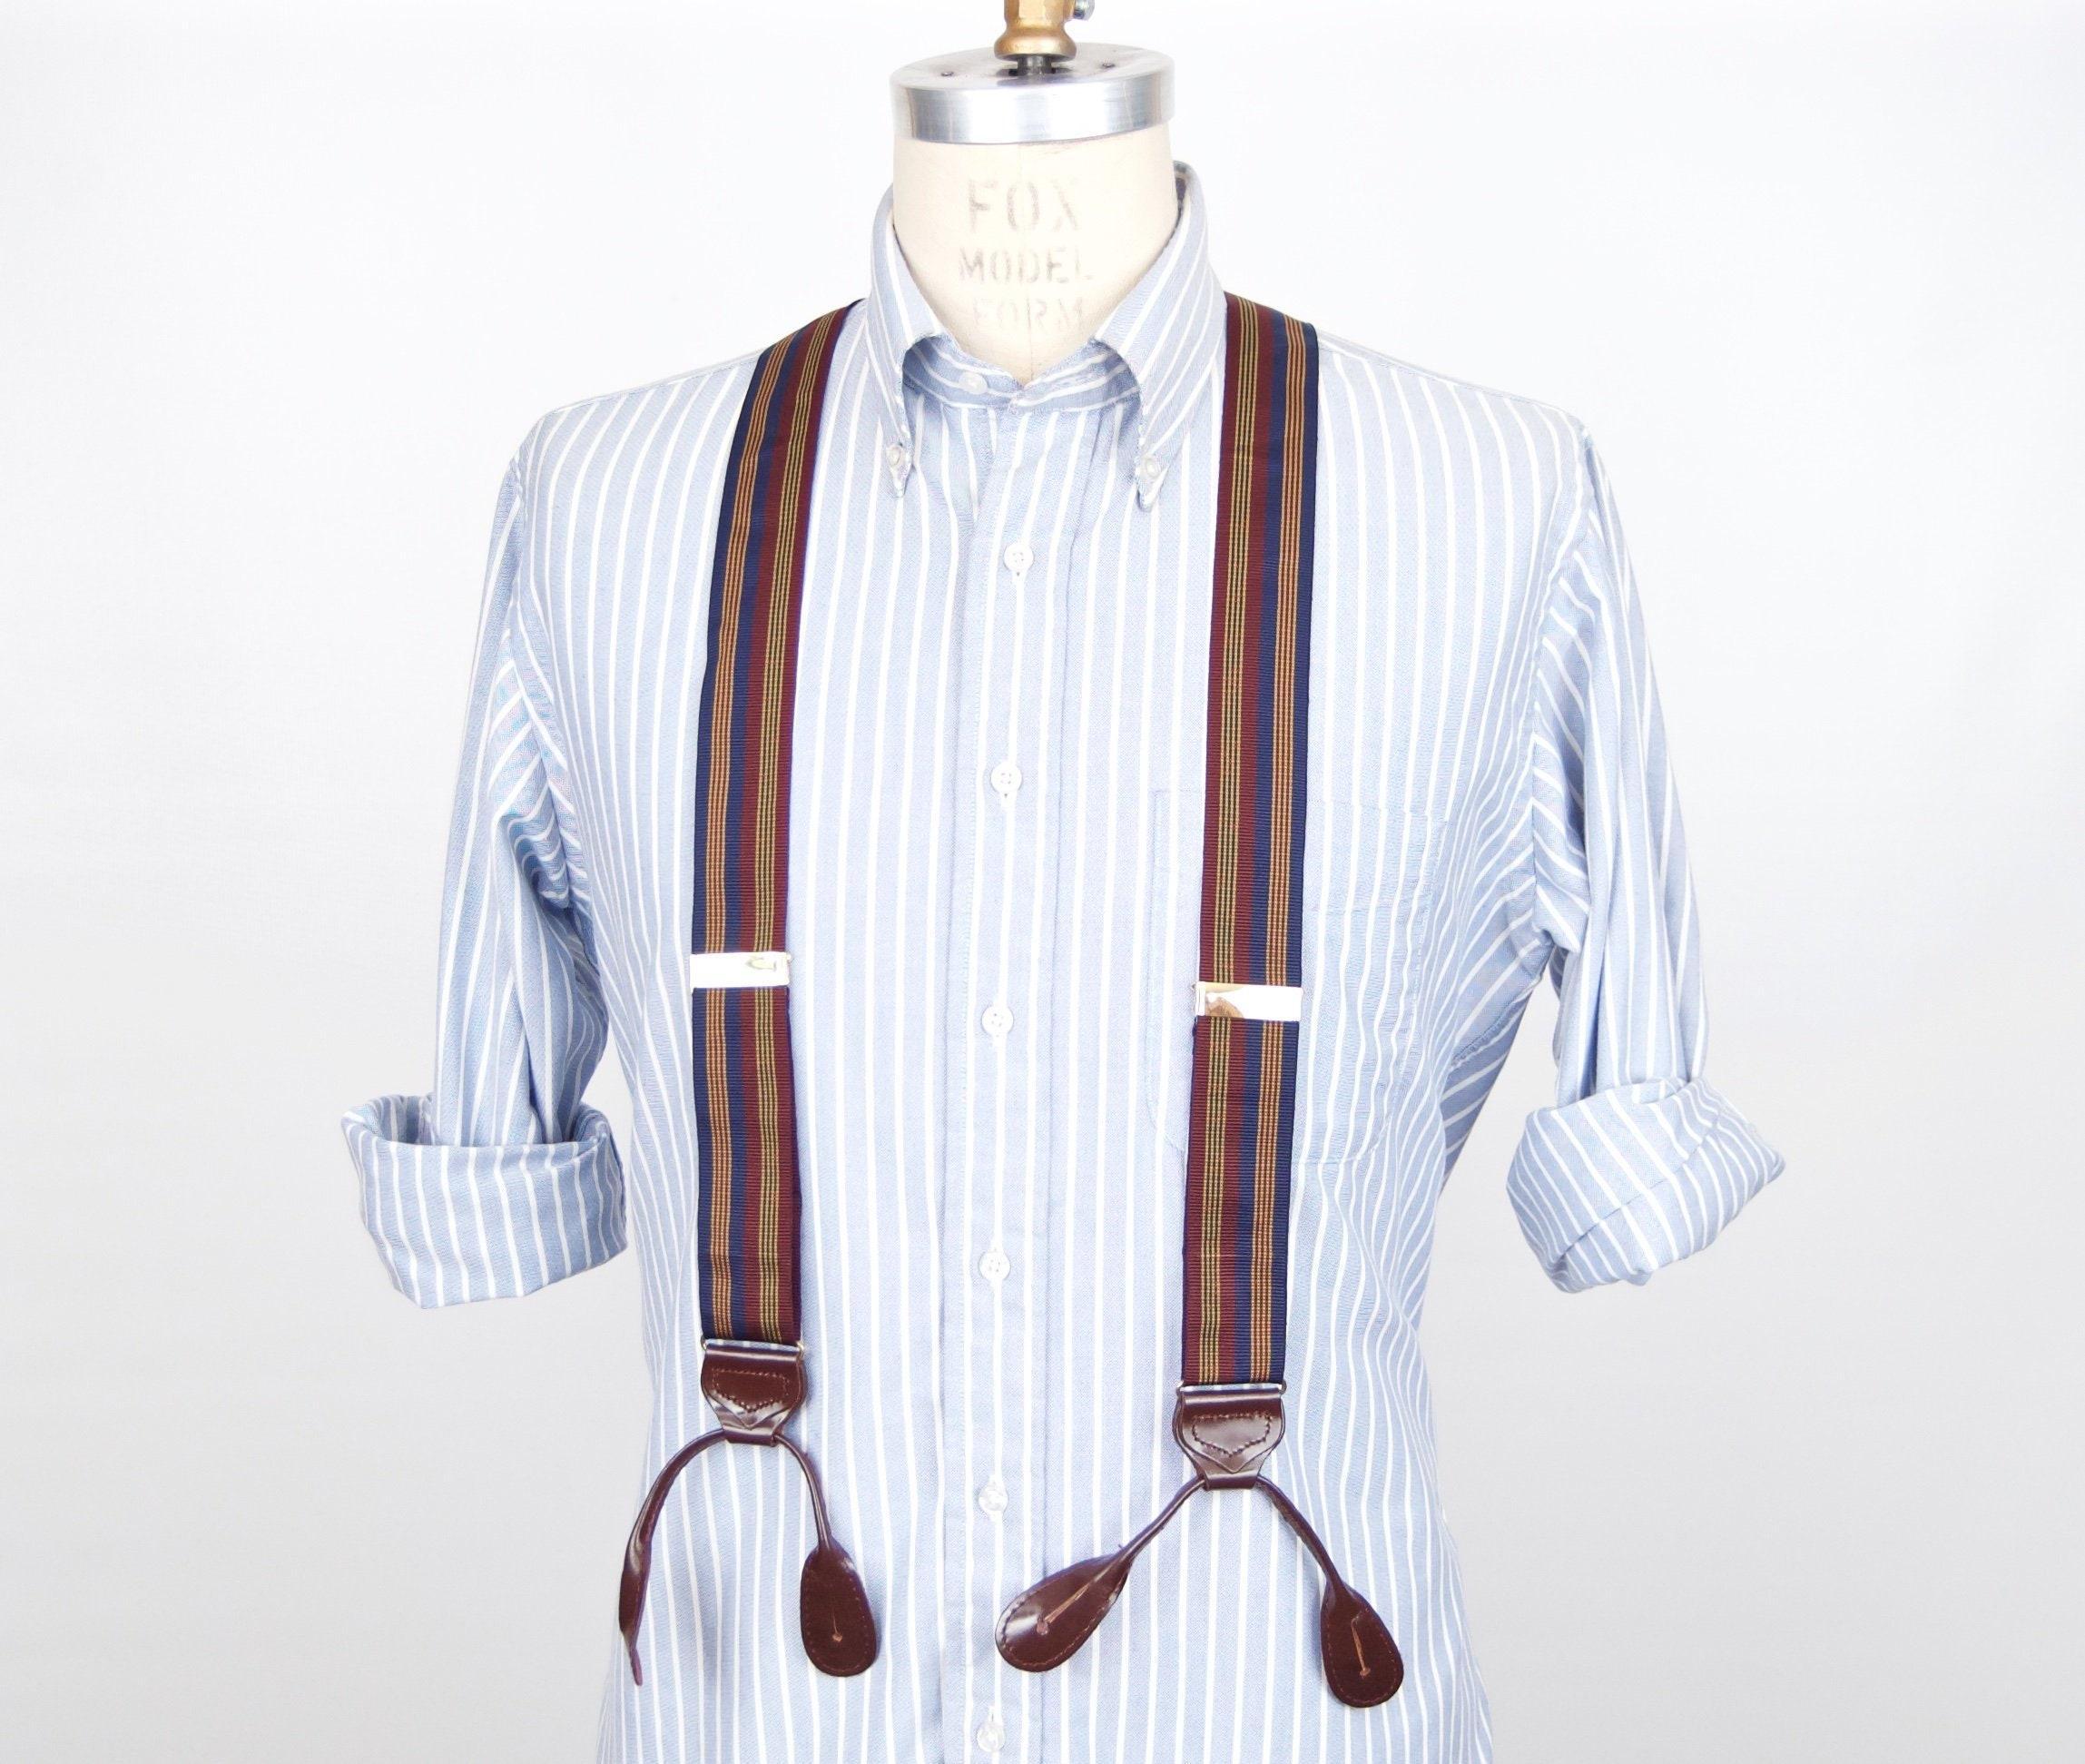 New Y back Men/'s Suspenders Braces clip on convertible Navy blue beige Stripes